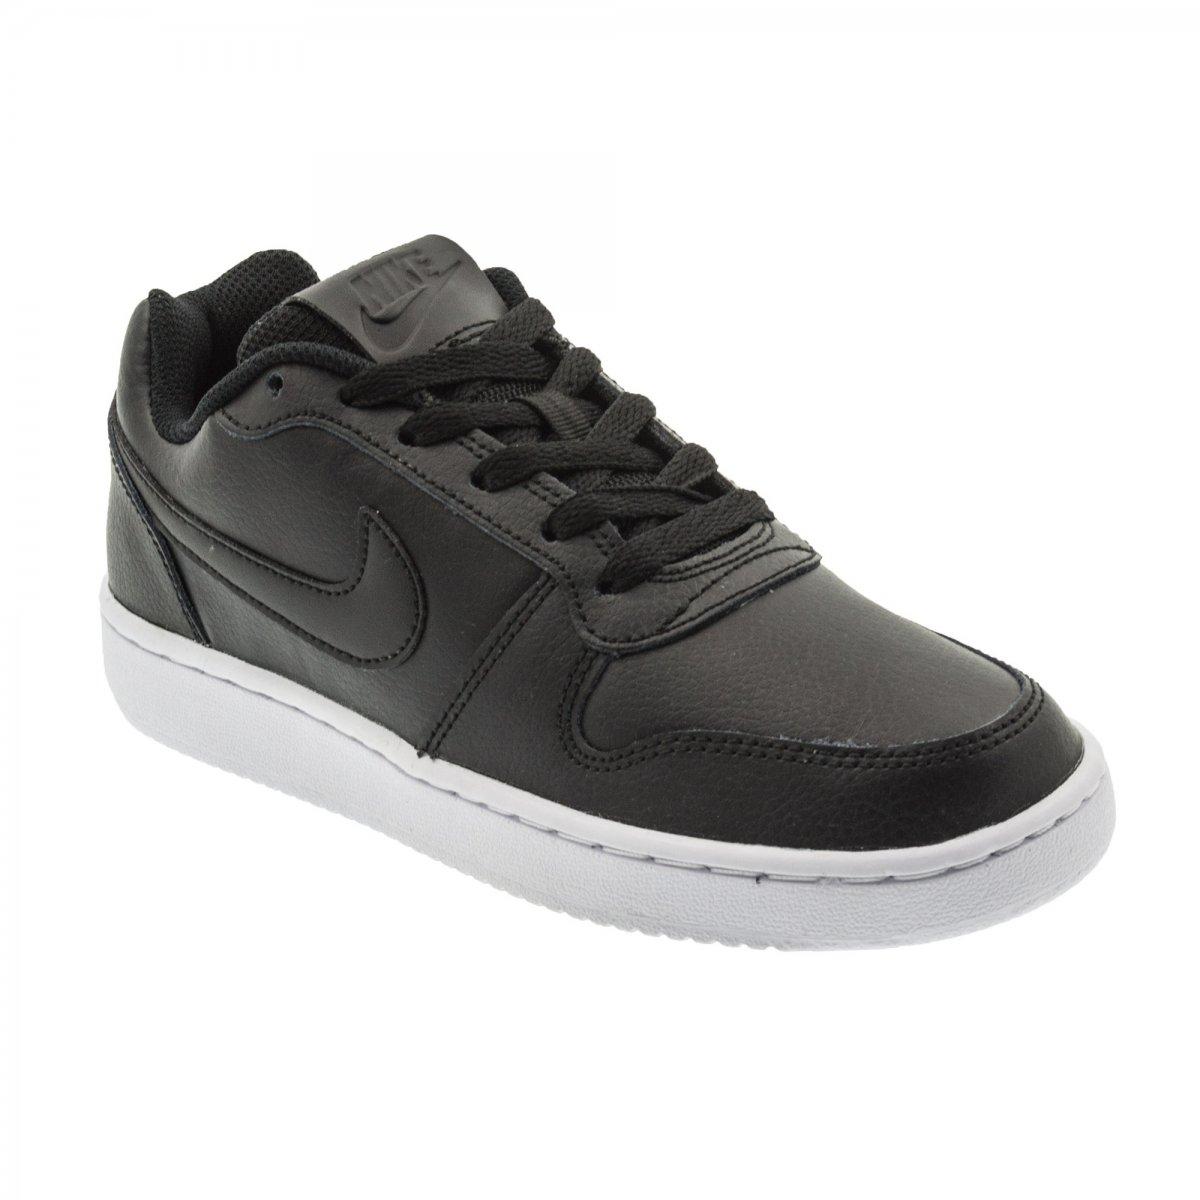 e086b0aae7e Tênis Nike Ebernon Low Prem Feminino AQ1779-001 - Preto Branco ...